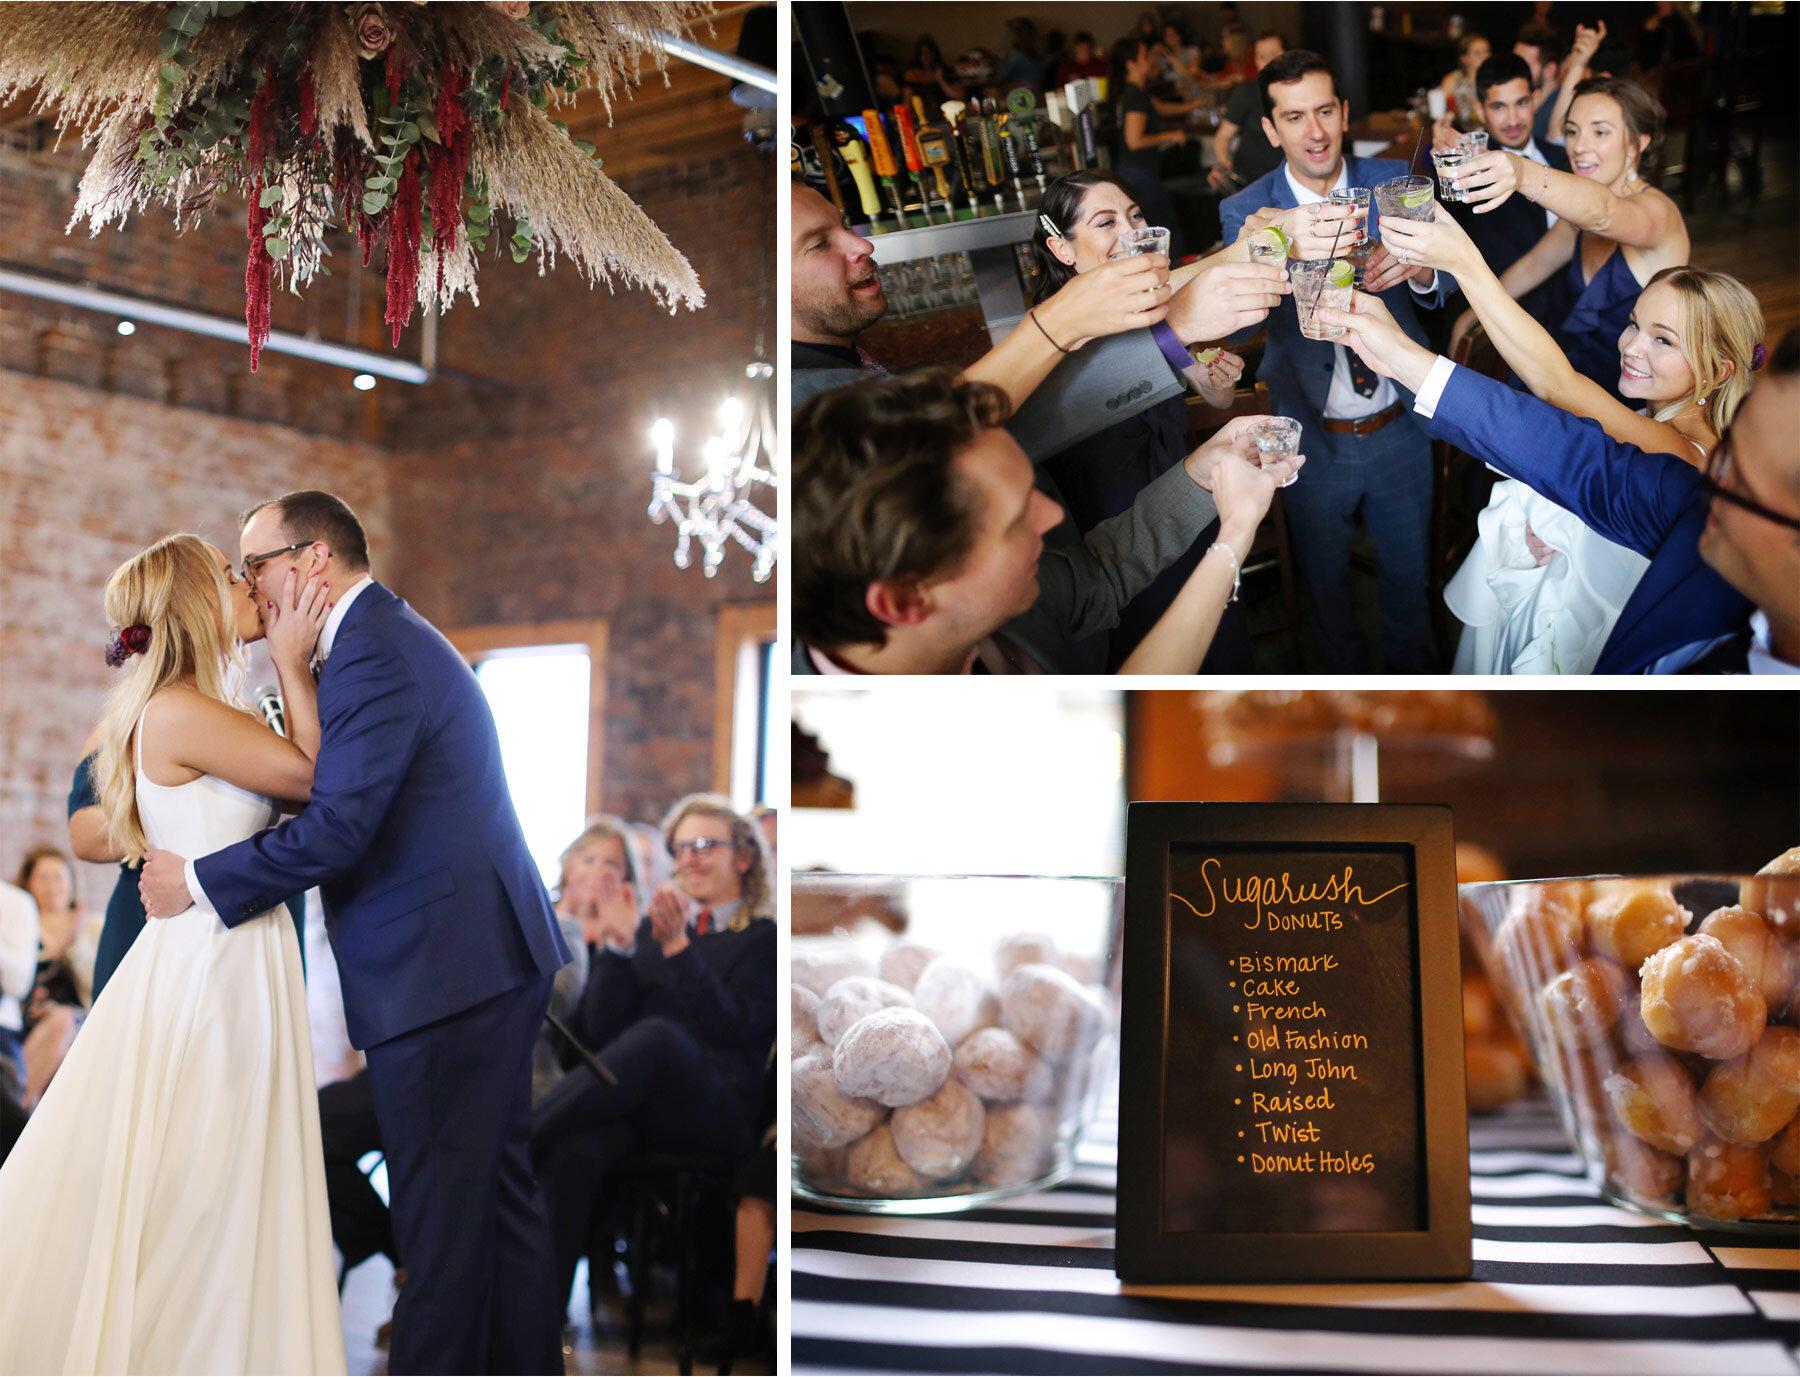 11-Vick-Photography-Wedding-Minneapolis-Minnesota-Earl-and-Wilson-Bride-Groom-Ceremony-Toast-Donuts-Danielle-and-Tom.jpg